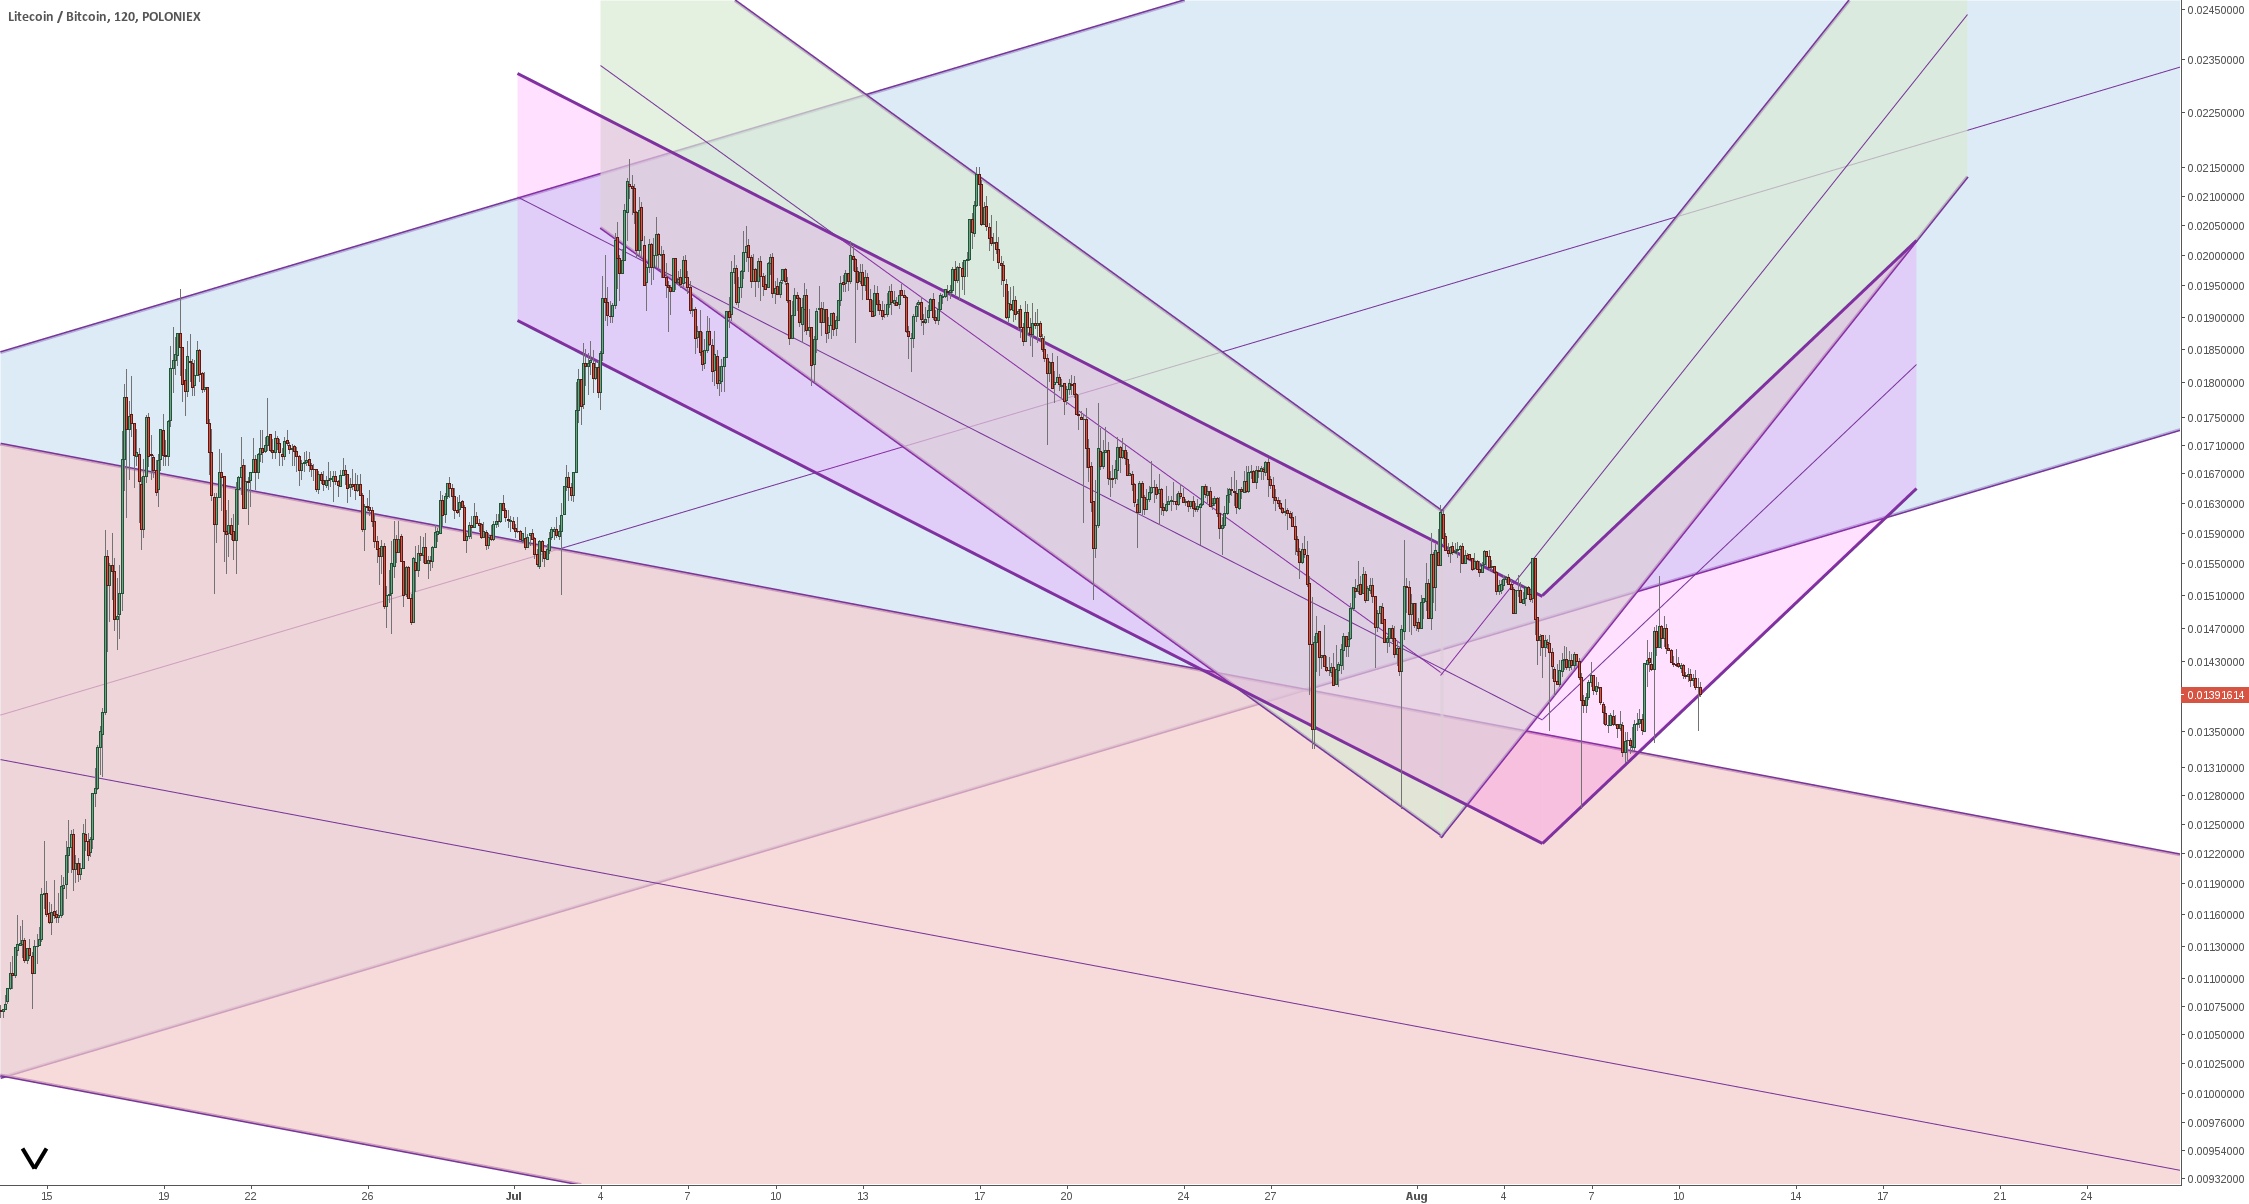 Litecoin/Bitcoin - twin trend channel pattern